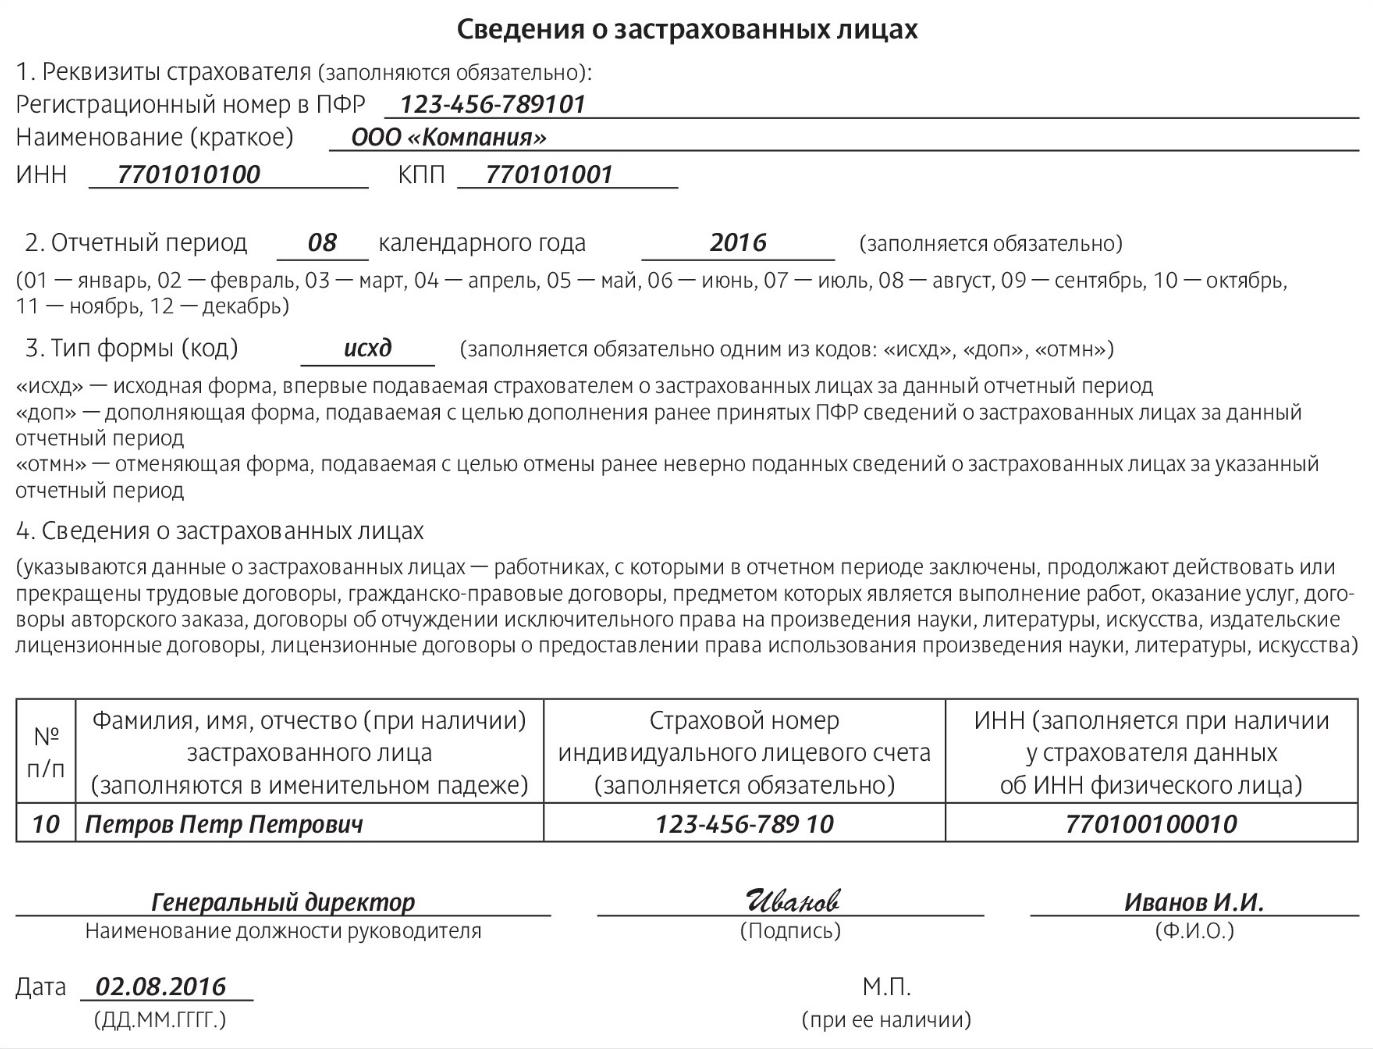 Минтруд утвердил регламент предоставления ПФР сведений по форме СЗИ-6